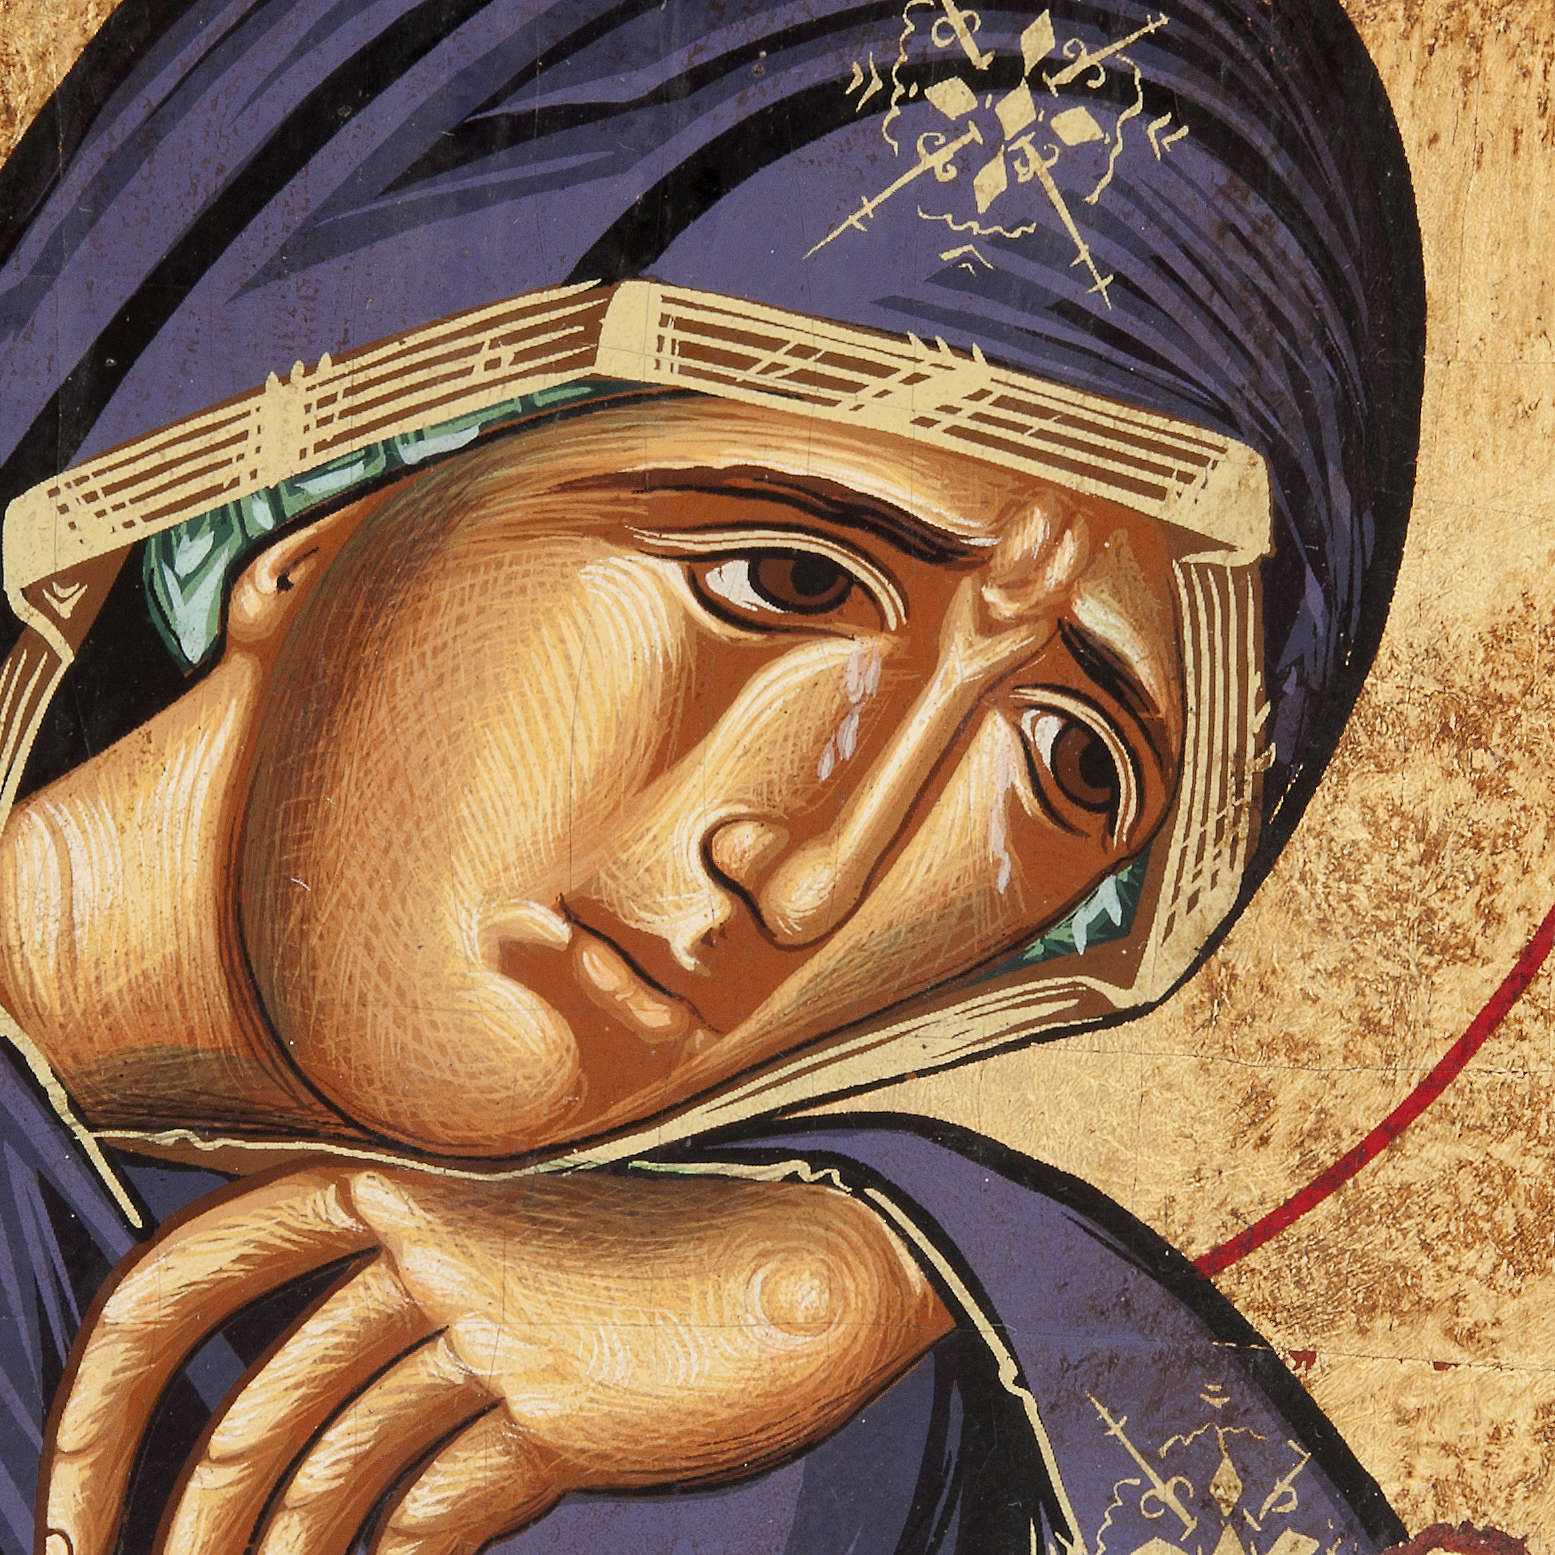 Our Lady of Sorrows icon, Greece, silkscreen printing 4